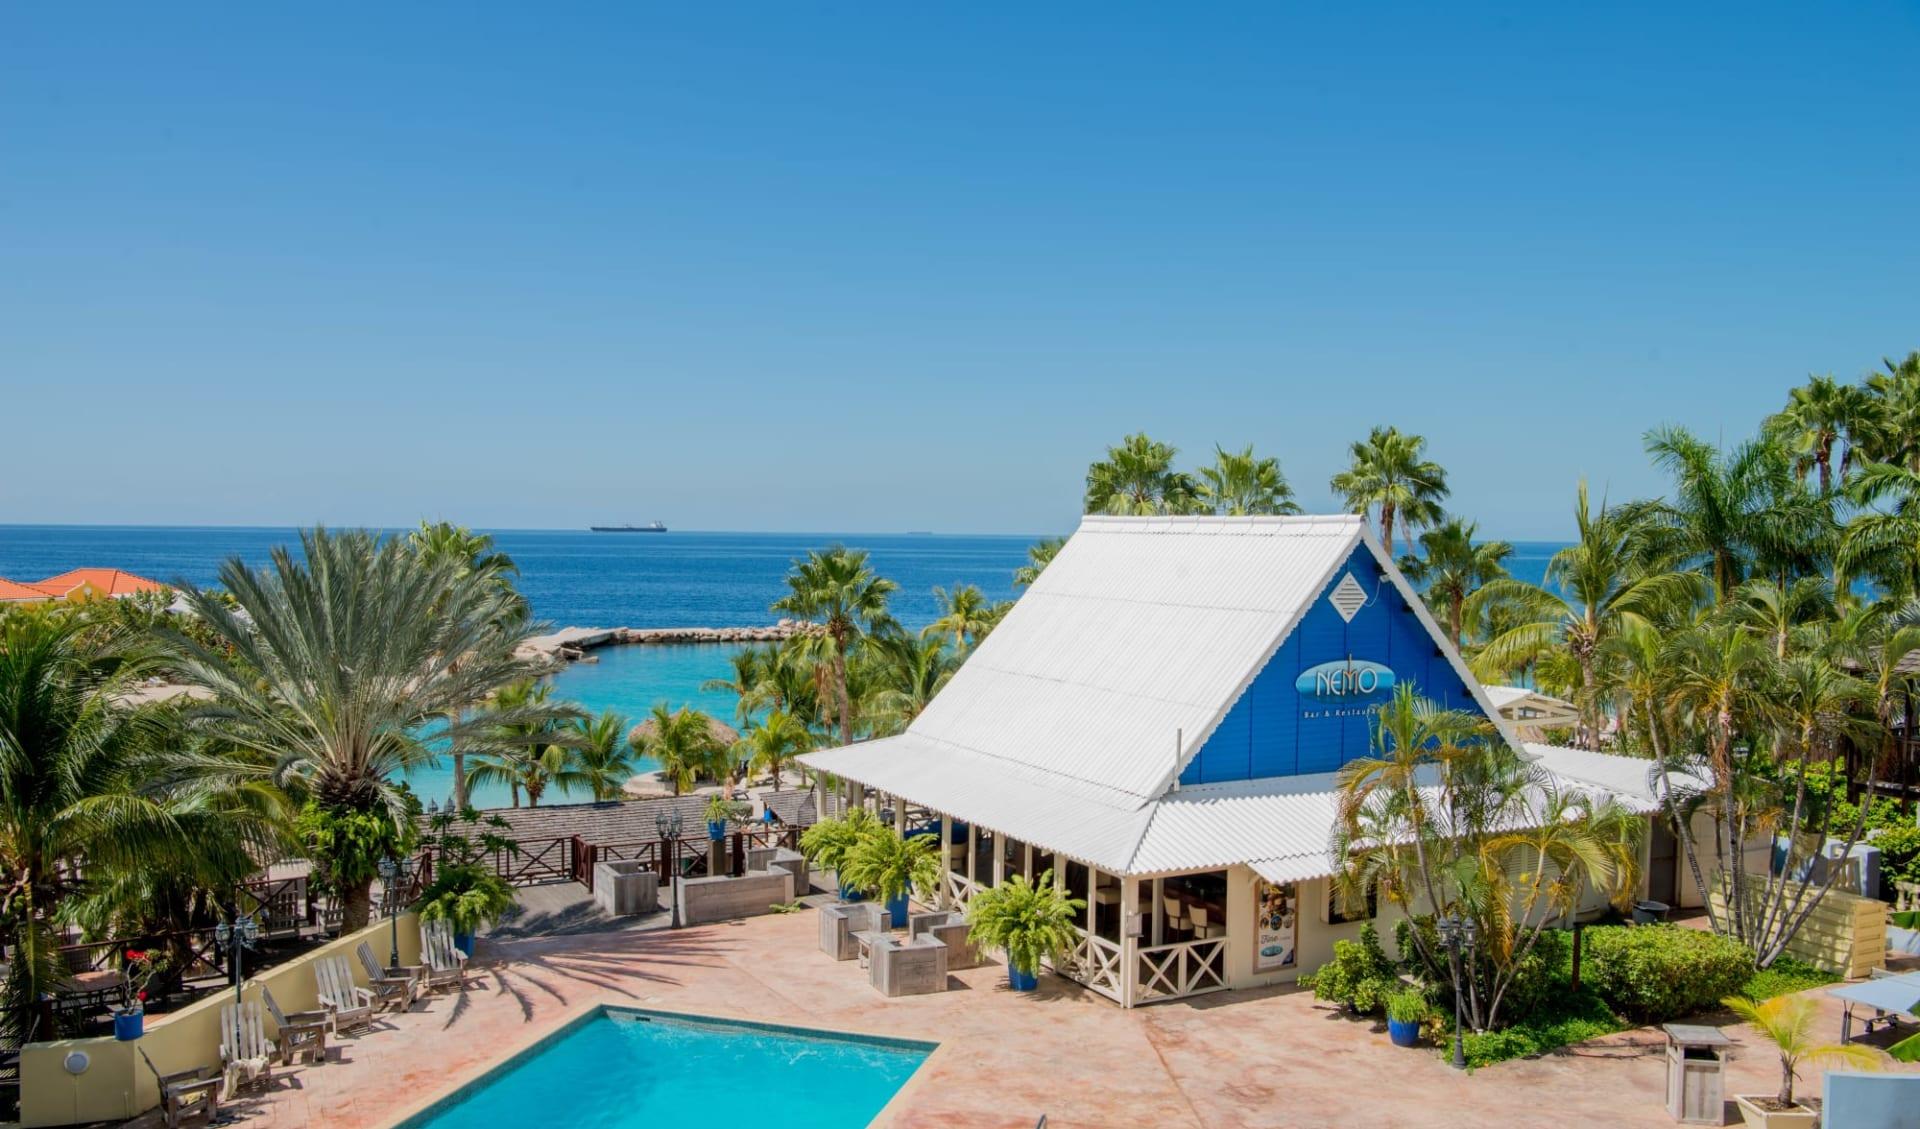 Lions Dive Beach Resort in Curaçao:  pool: Nemo Pool